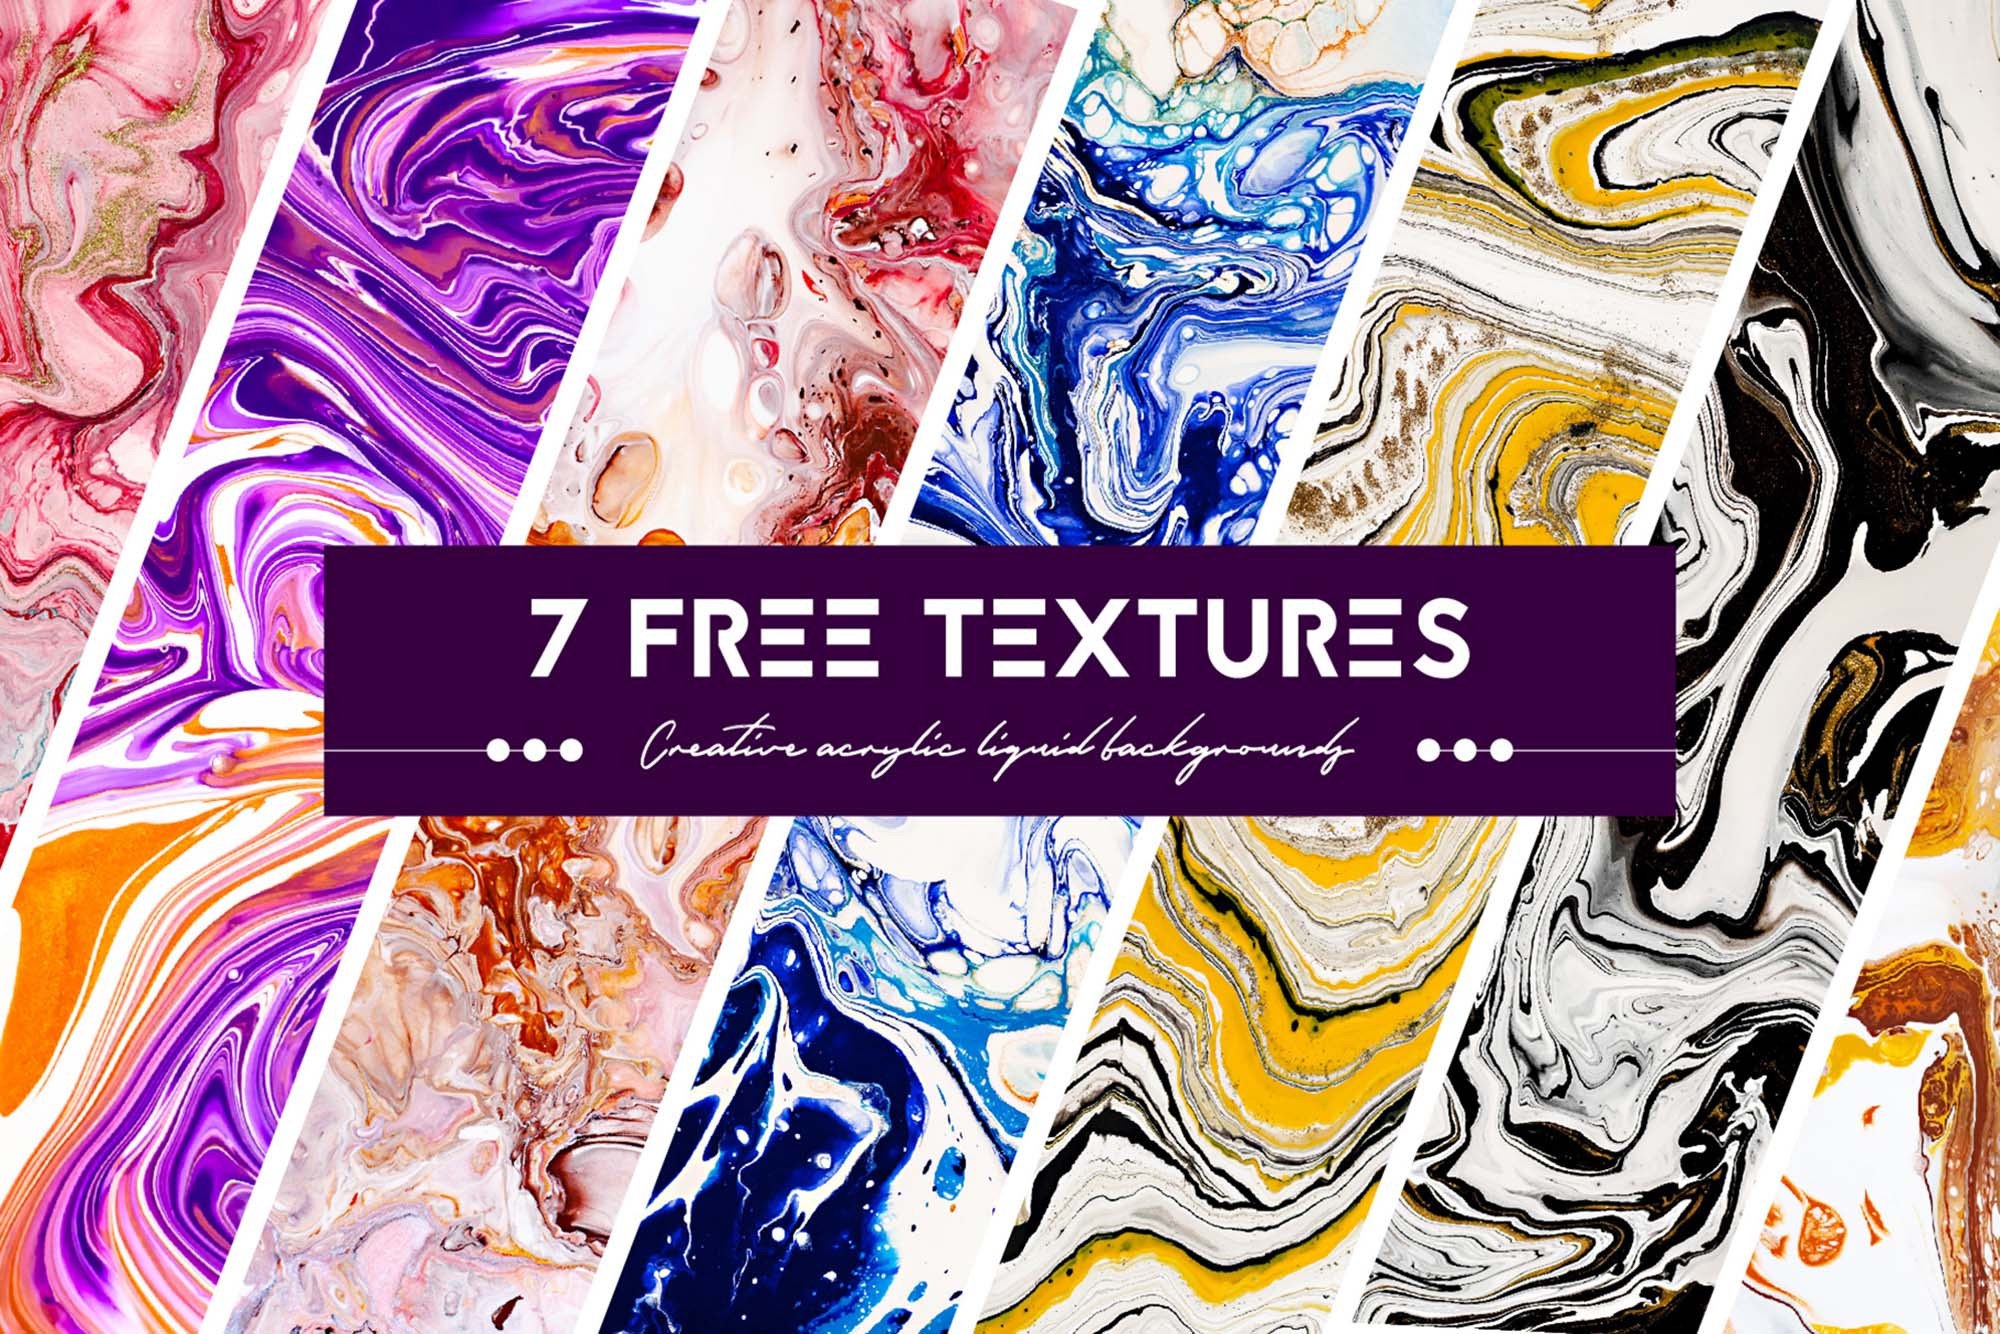 Acrylic Liquid Paint Textures